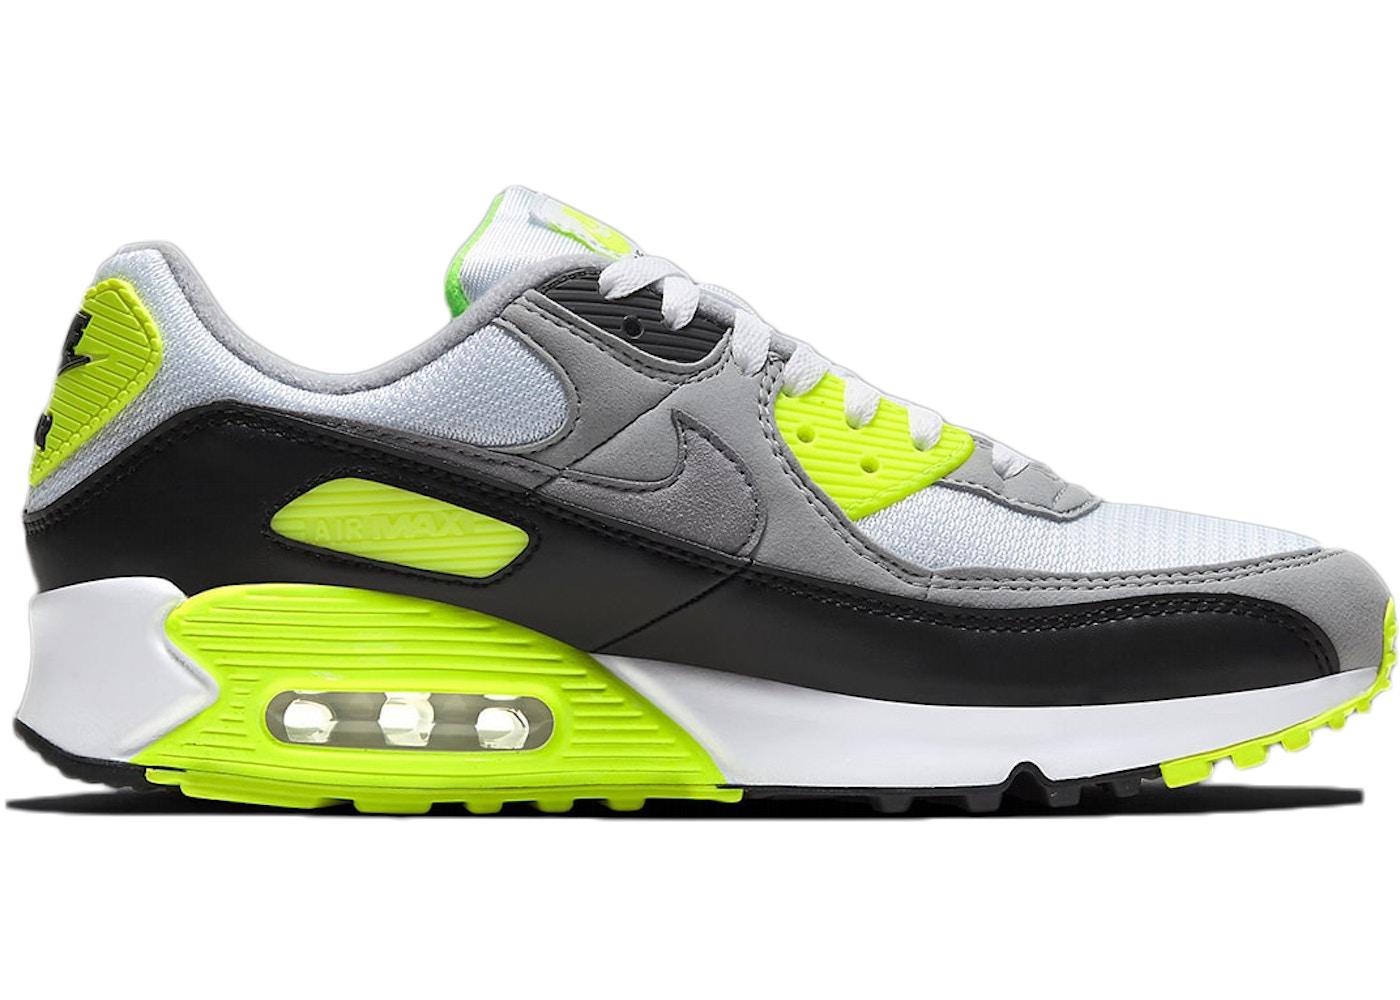 Nike Air Max 90 Og Volt 2020 Cd0881 103